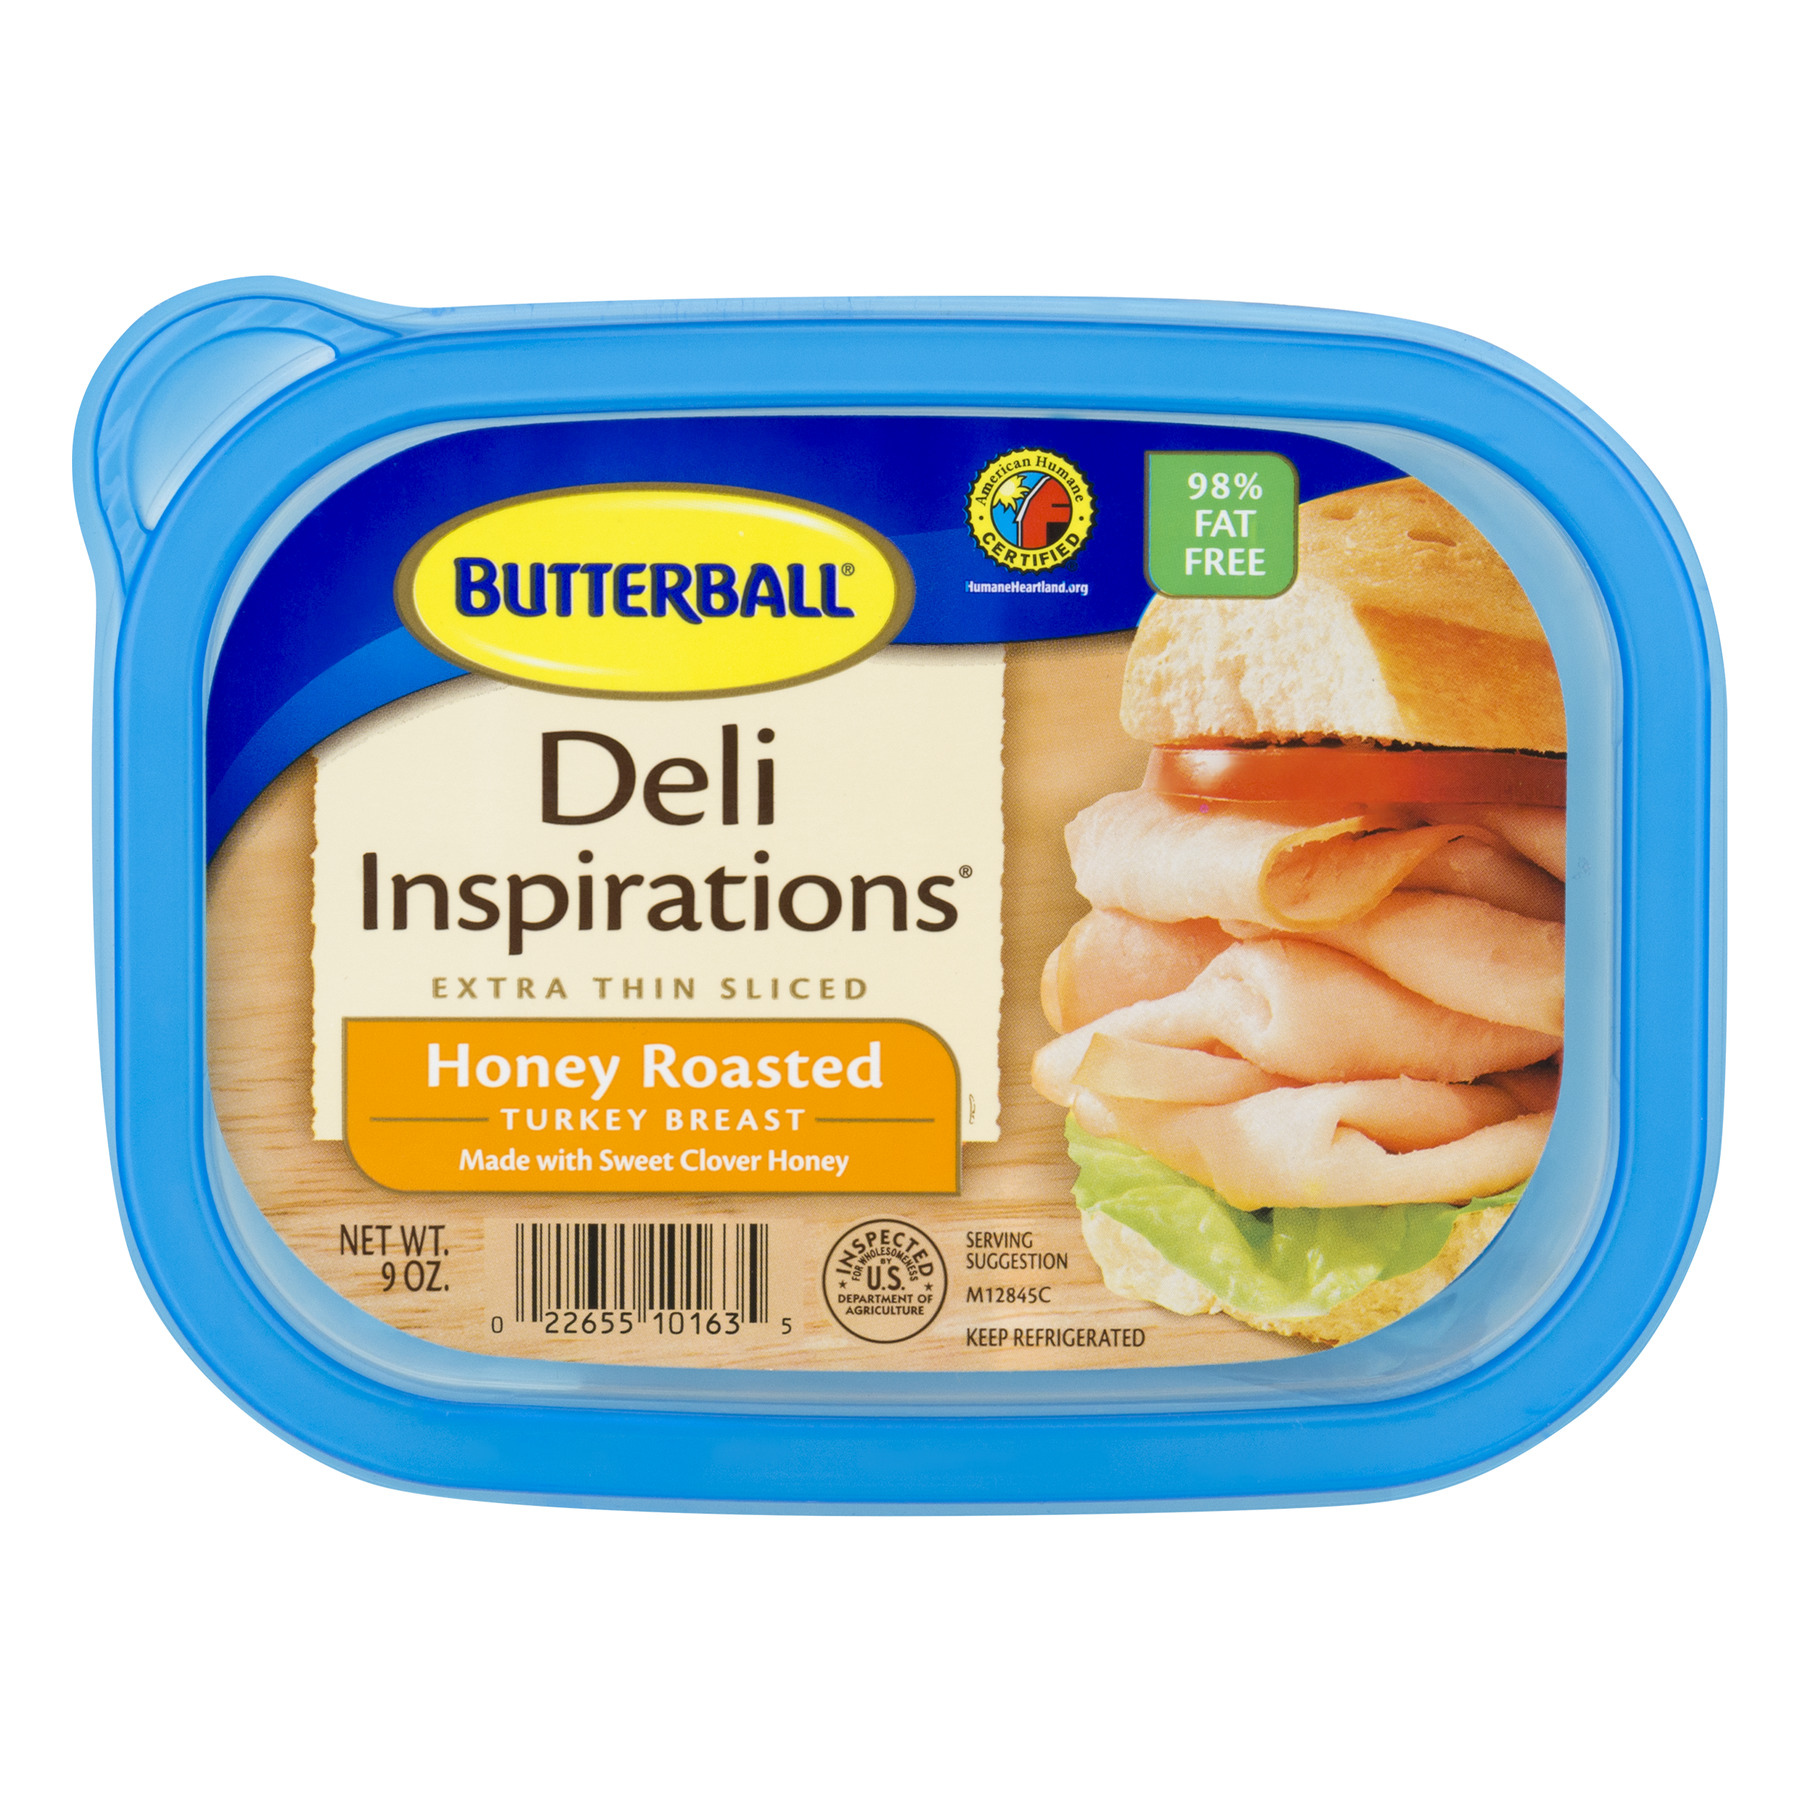 Butterball® Deli Inspirations Extra Thin Sliced Honey Roasted Turkey Breast 9 oz. Plastic Tub